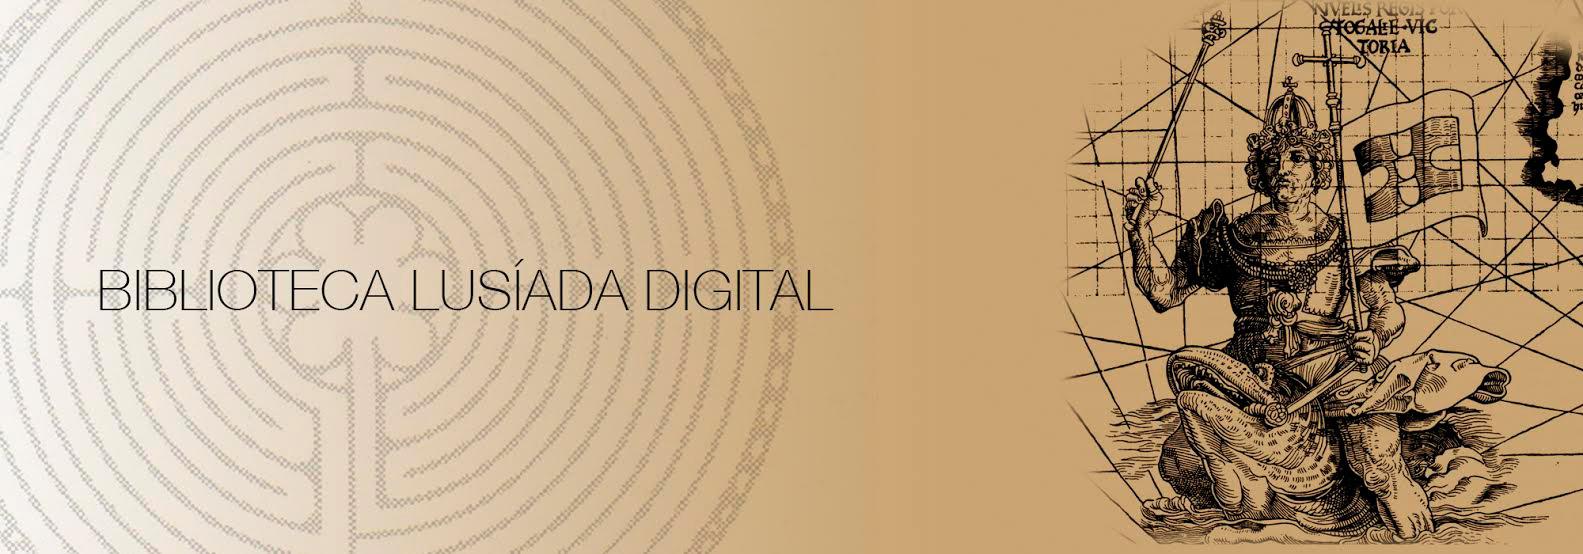 Biblioteca-Lusiada-Digital